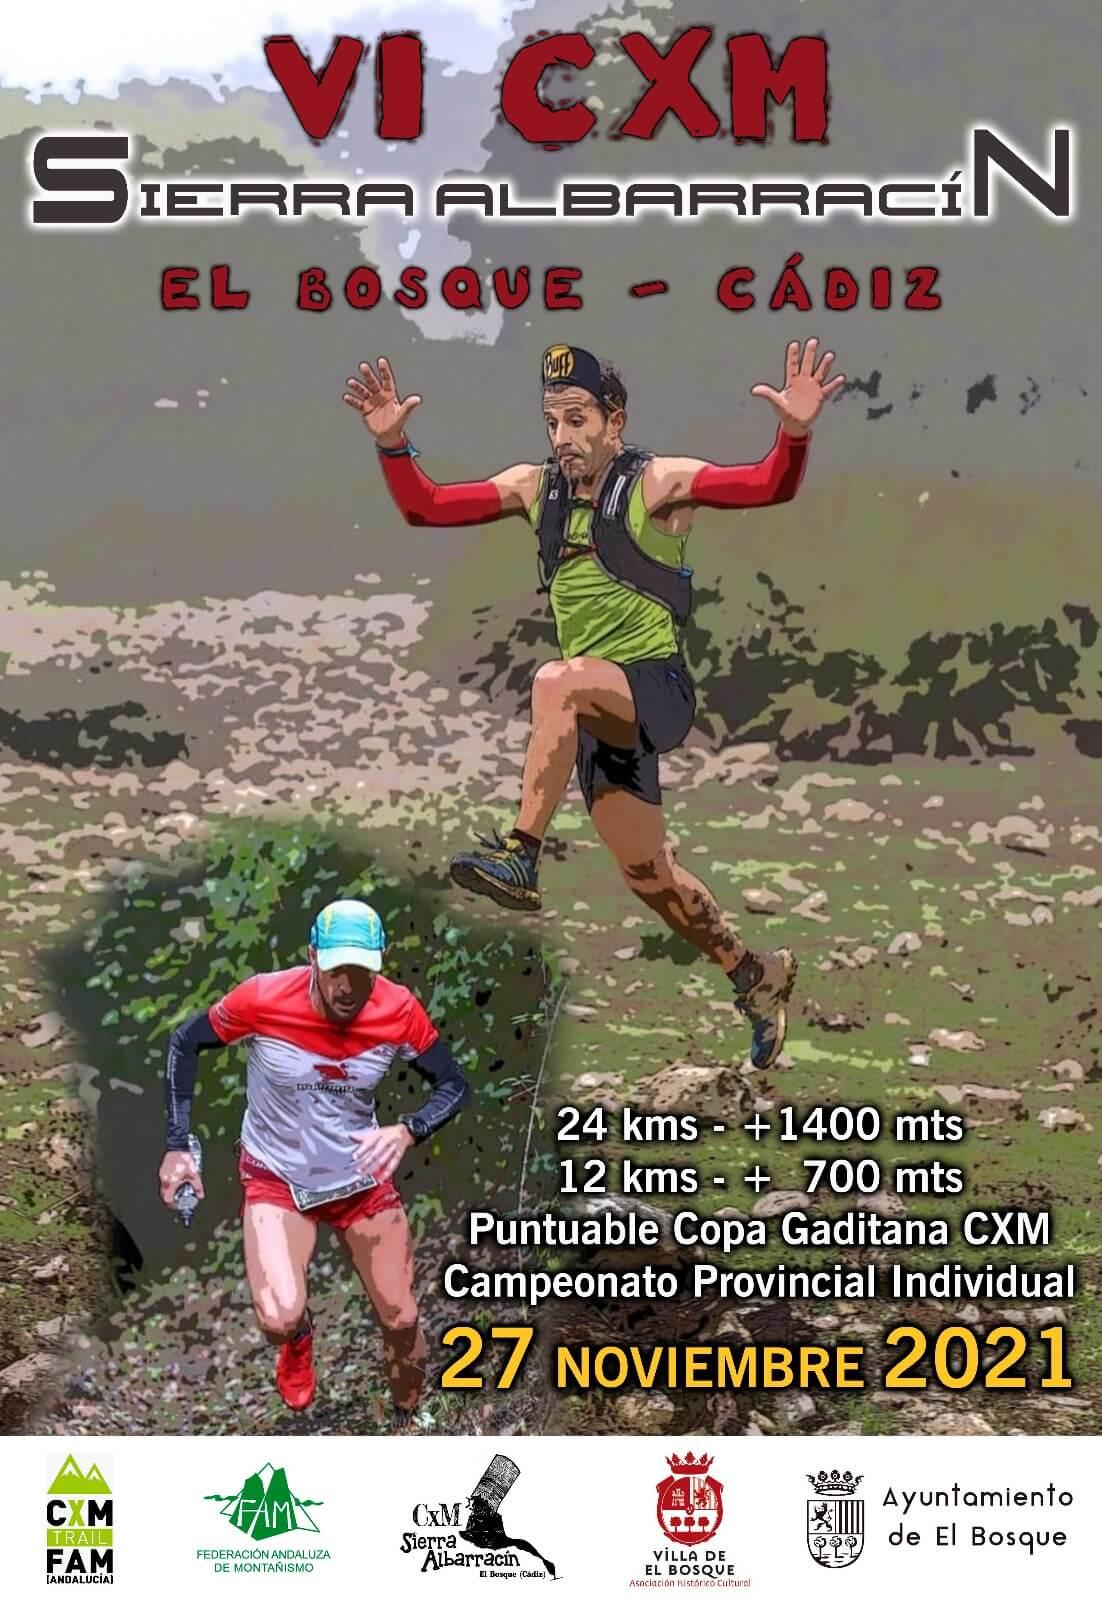 VI CxM Sierra de Albarracin